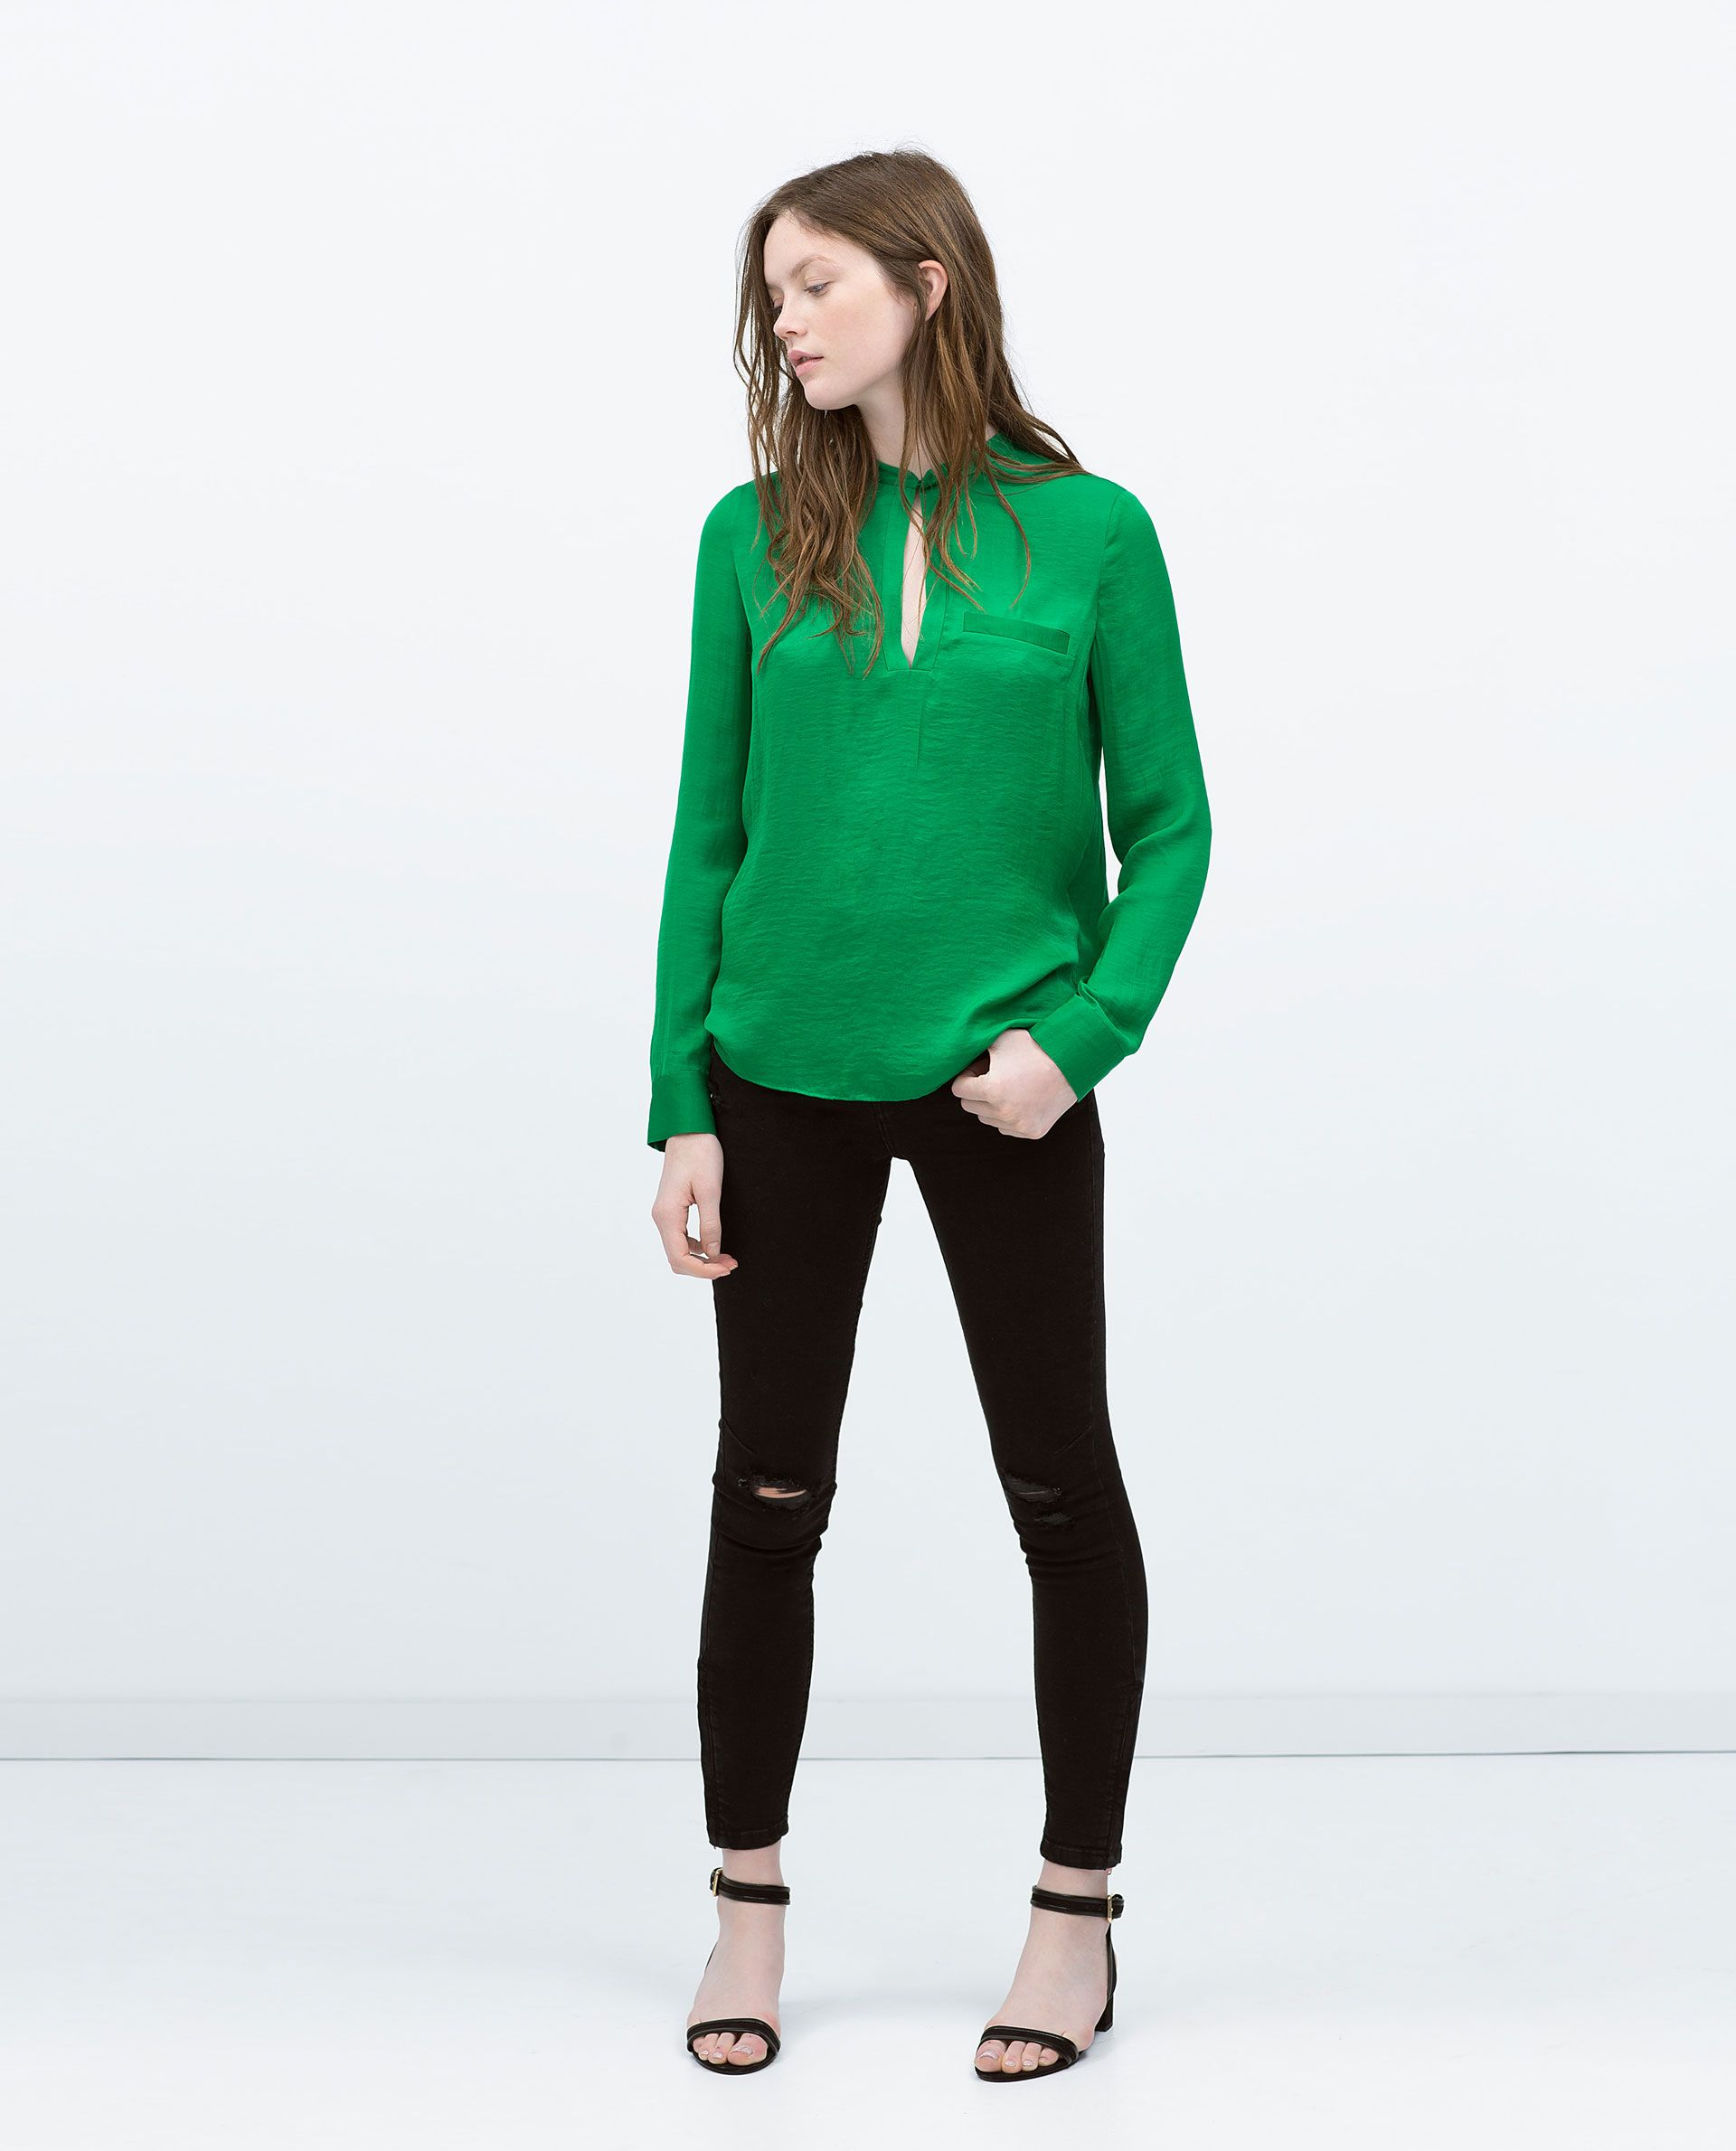 7eb9461aba3038 zara 4530004504 - Google Search Green Shirt Outfits